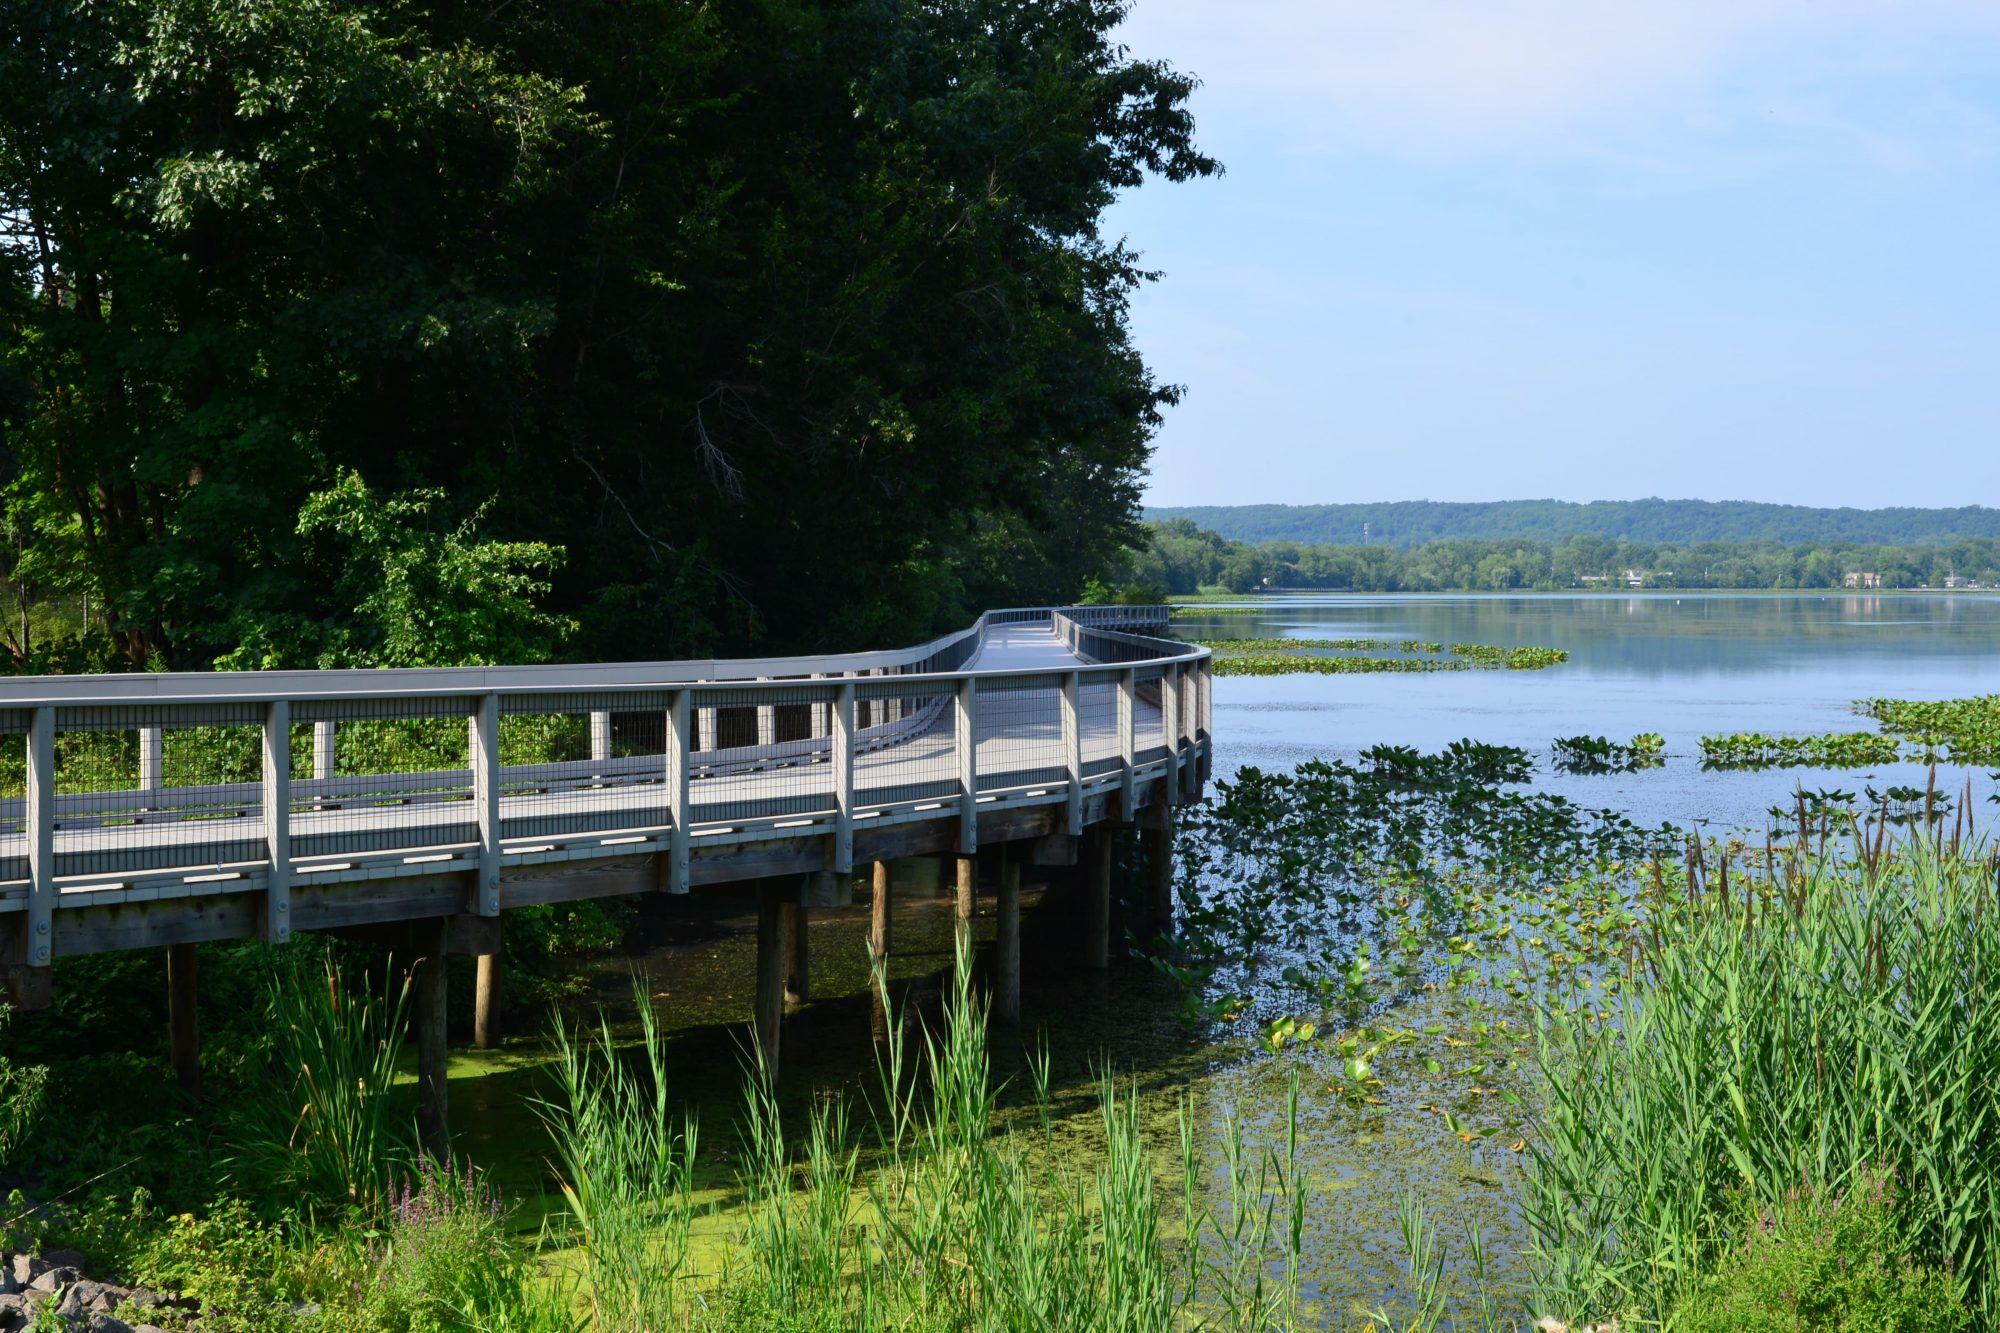 Congers Lake Earthen Dam and Boardwalk Project Image